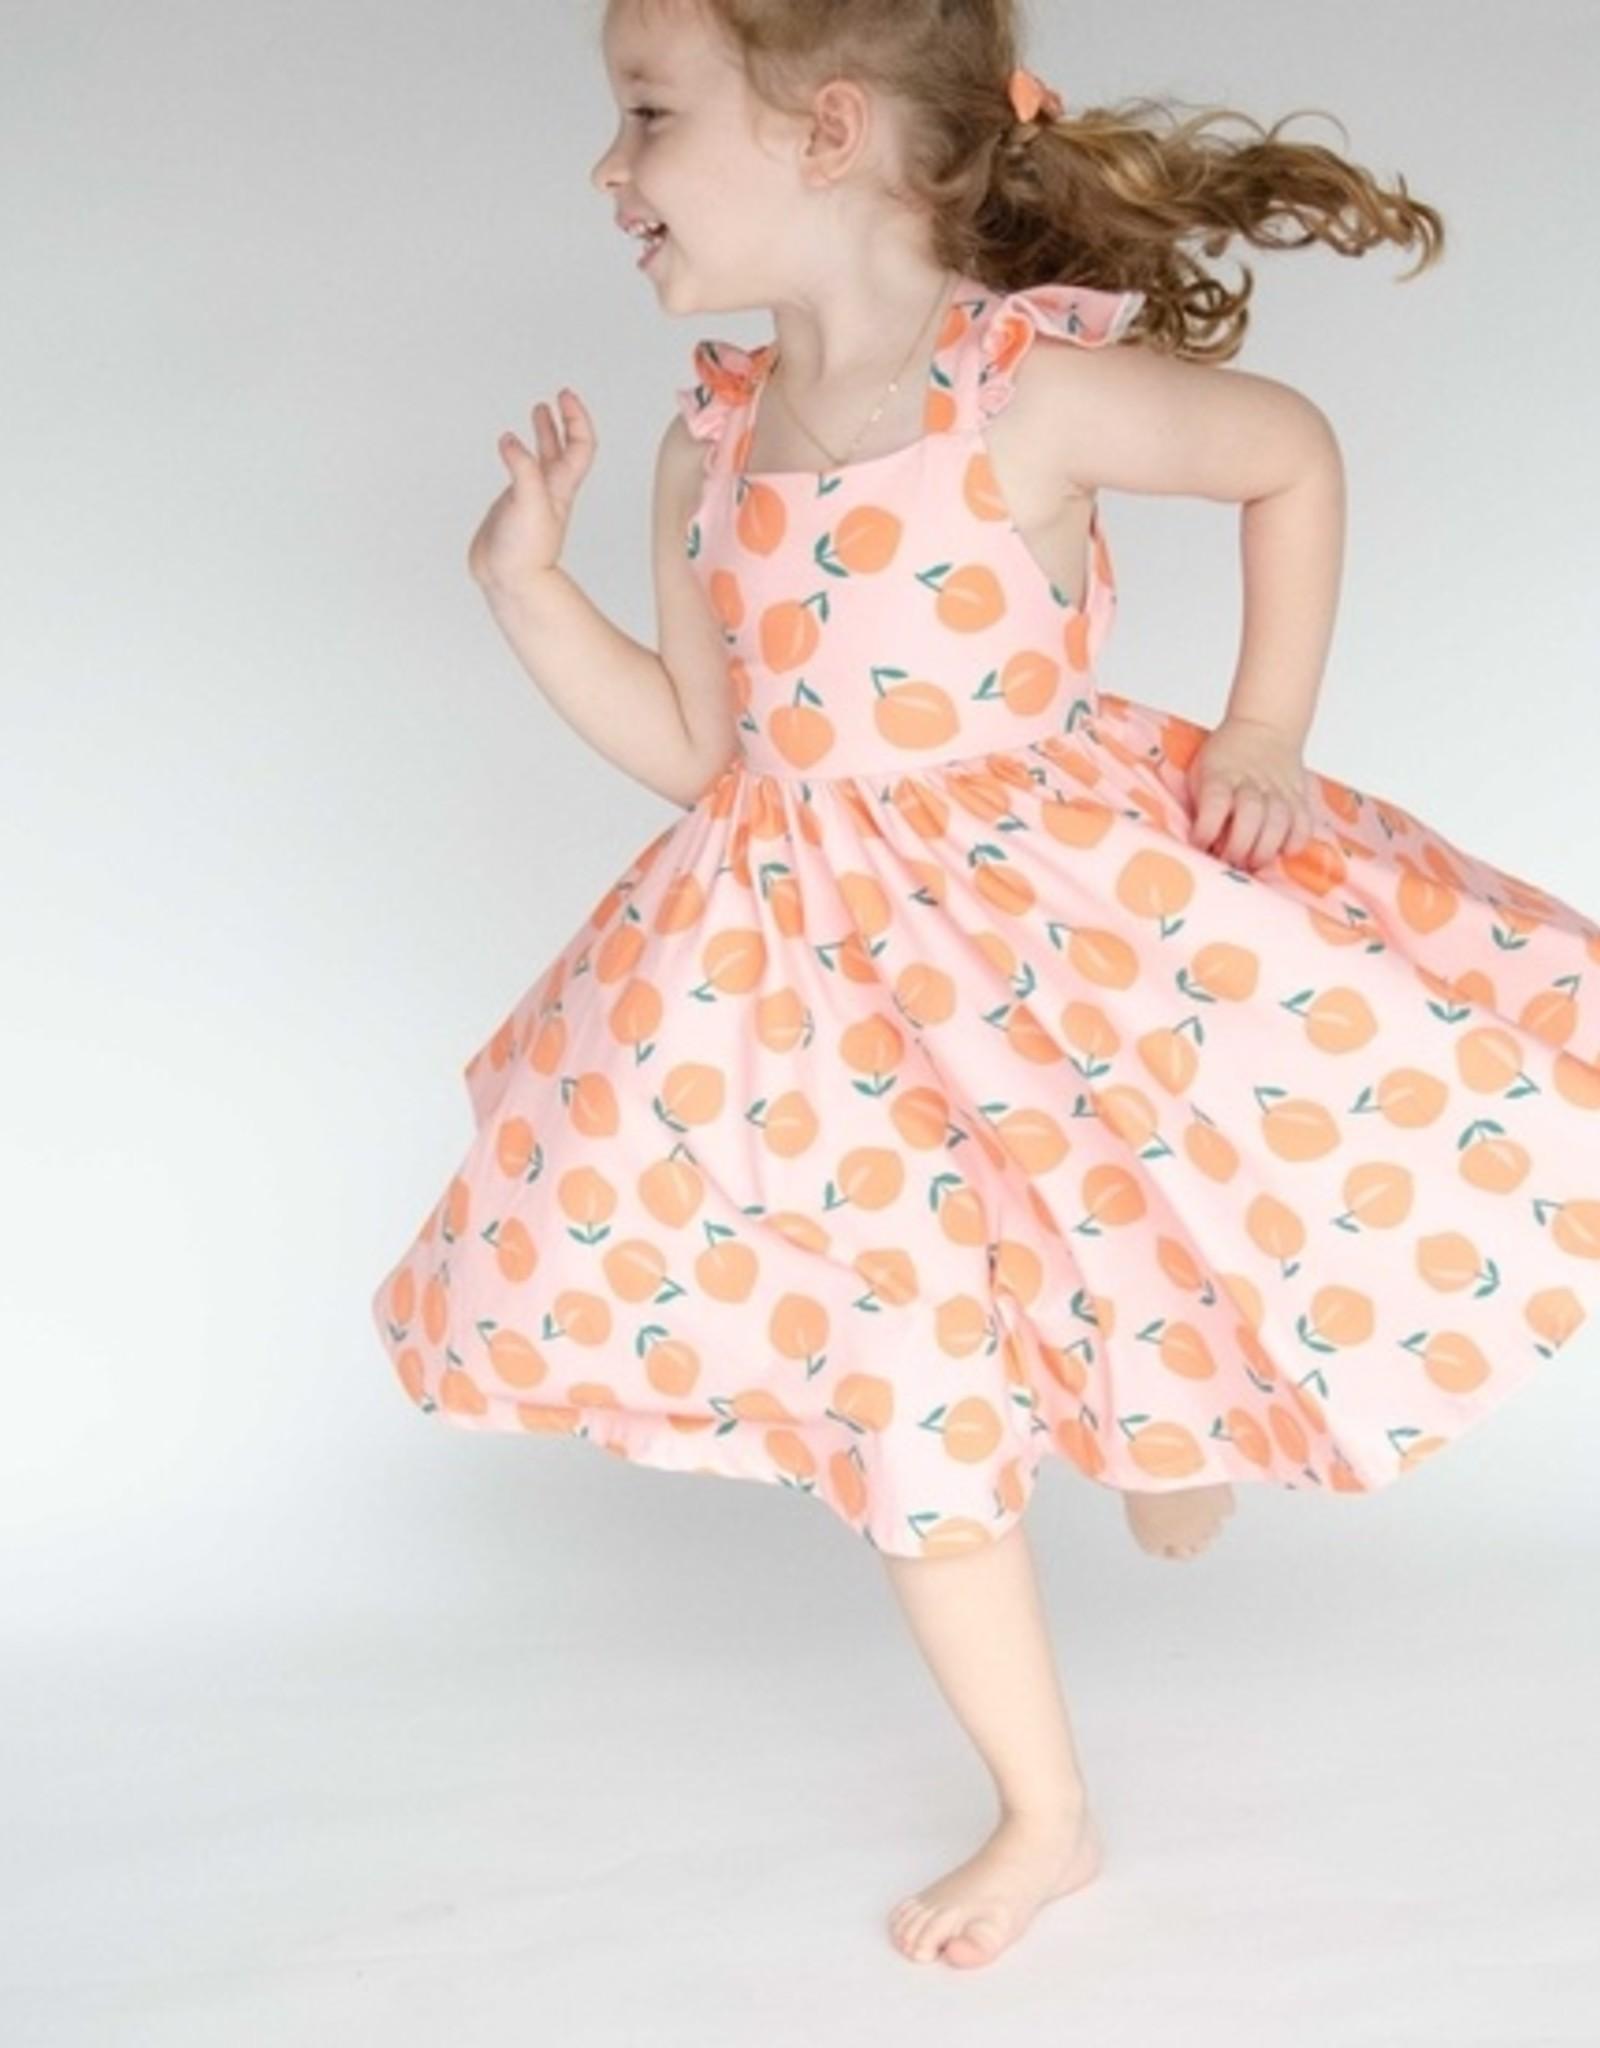 Peachy Twirl Dress 18-24 months